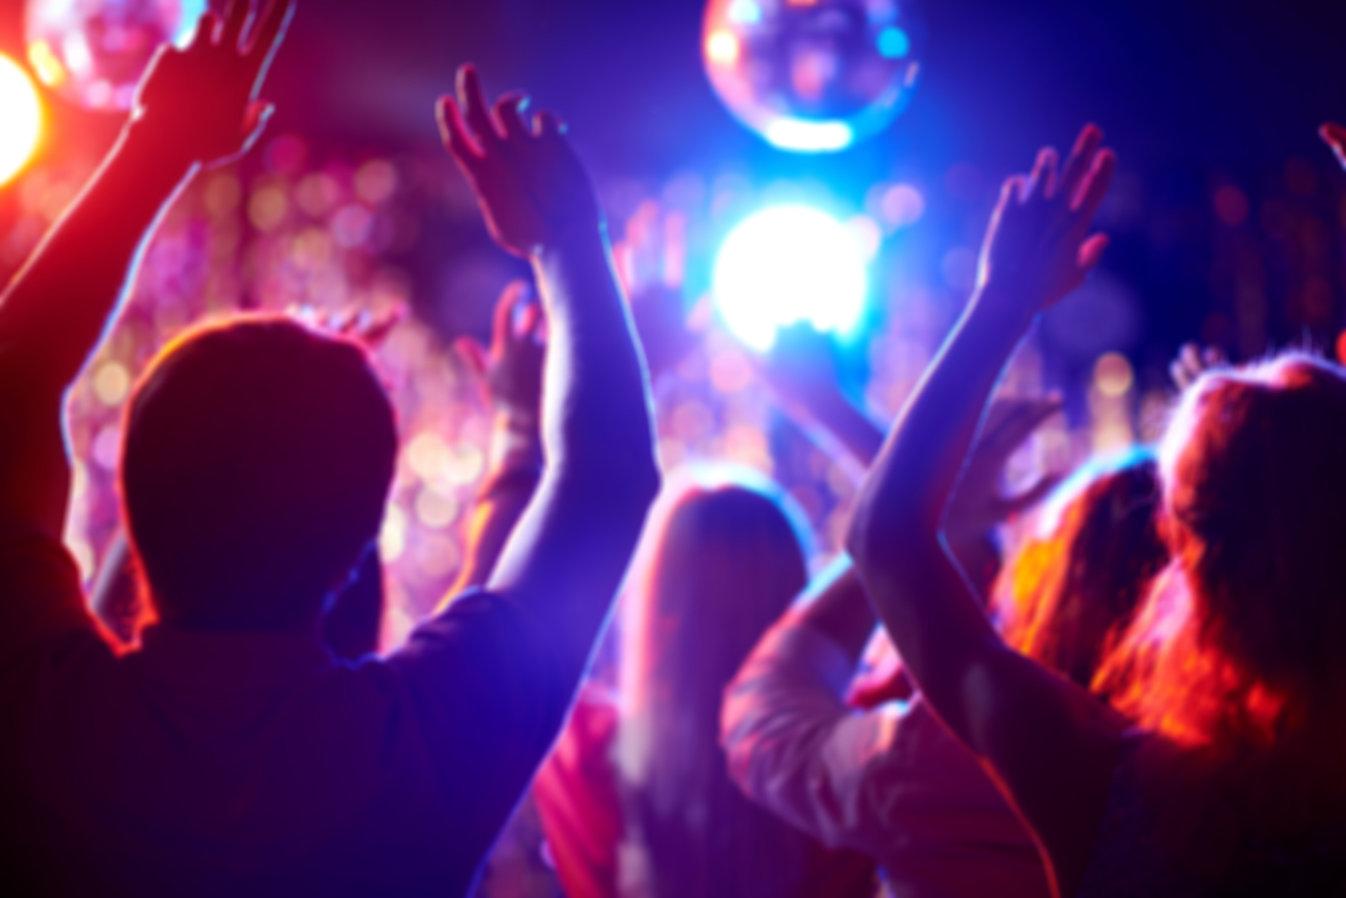 Dancing%20in%20night%20club_edited.jpg